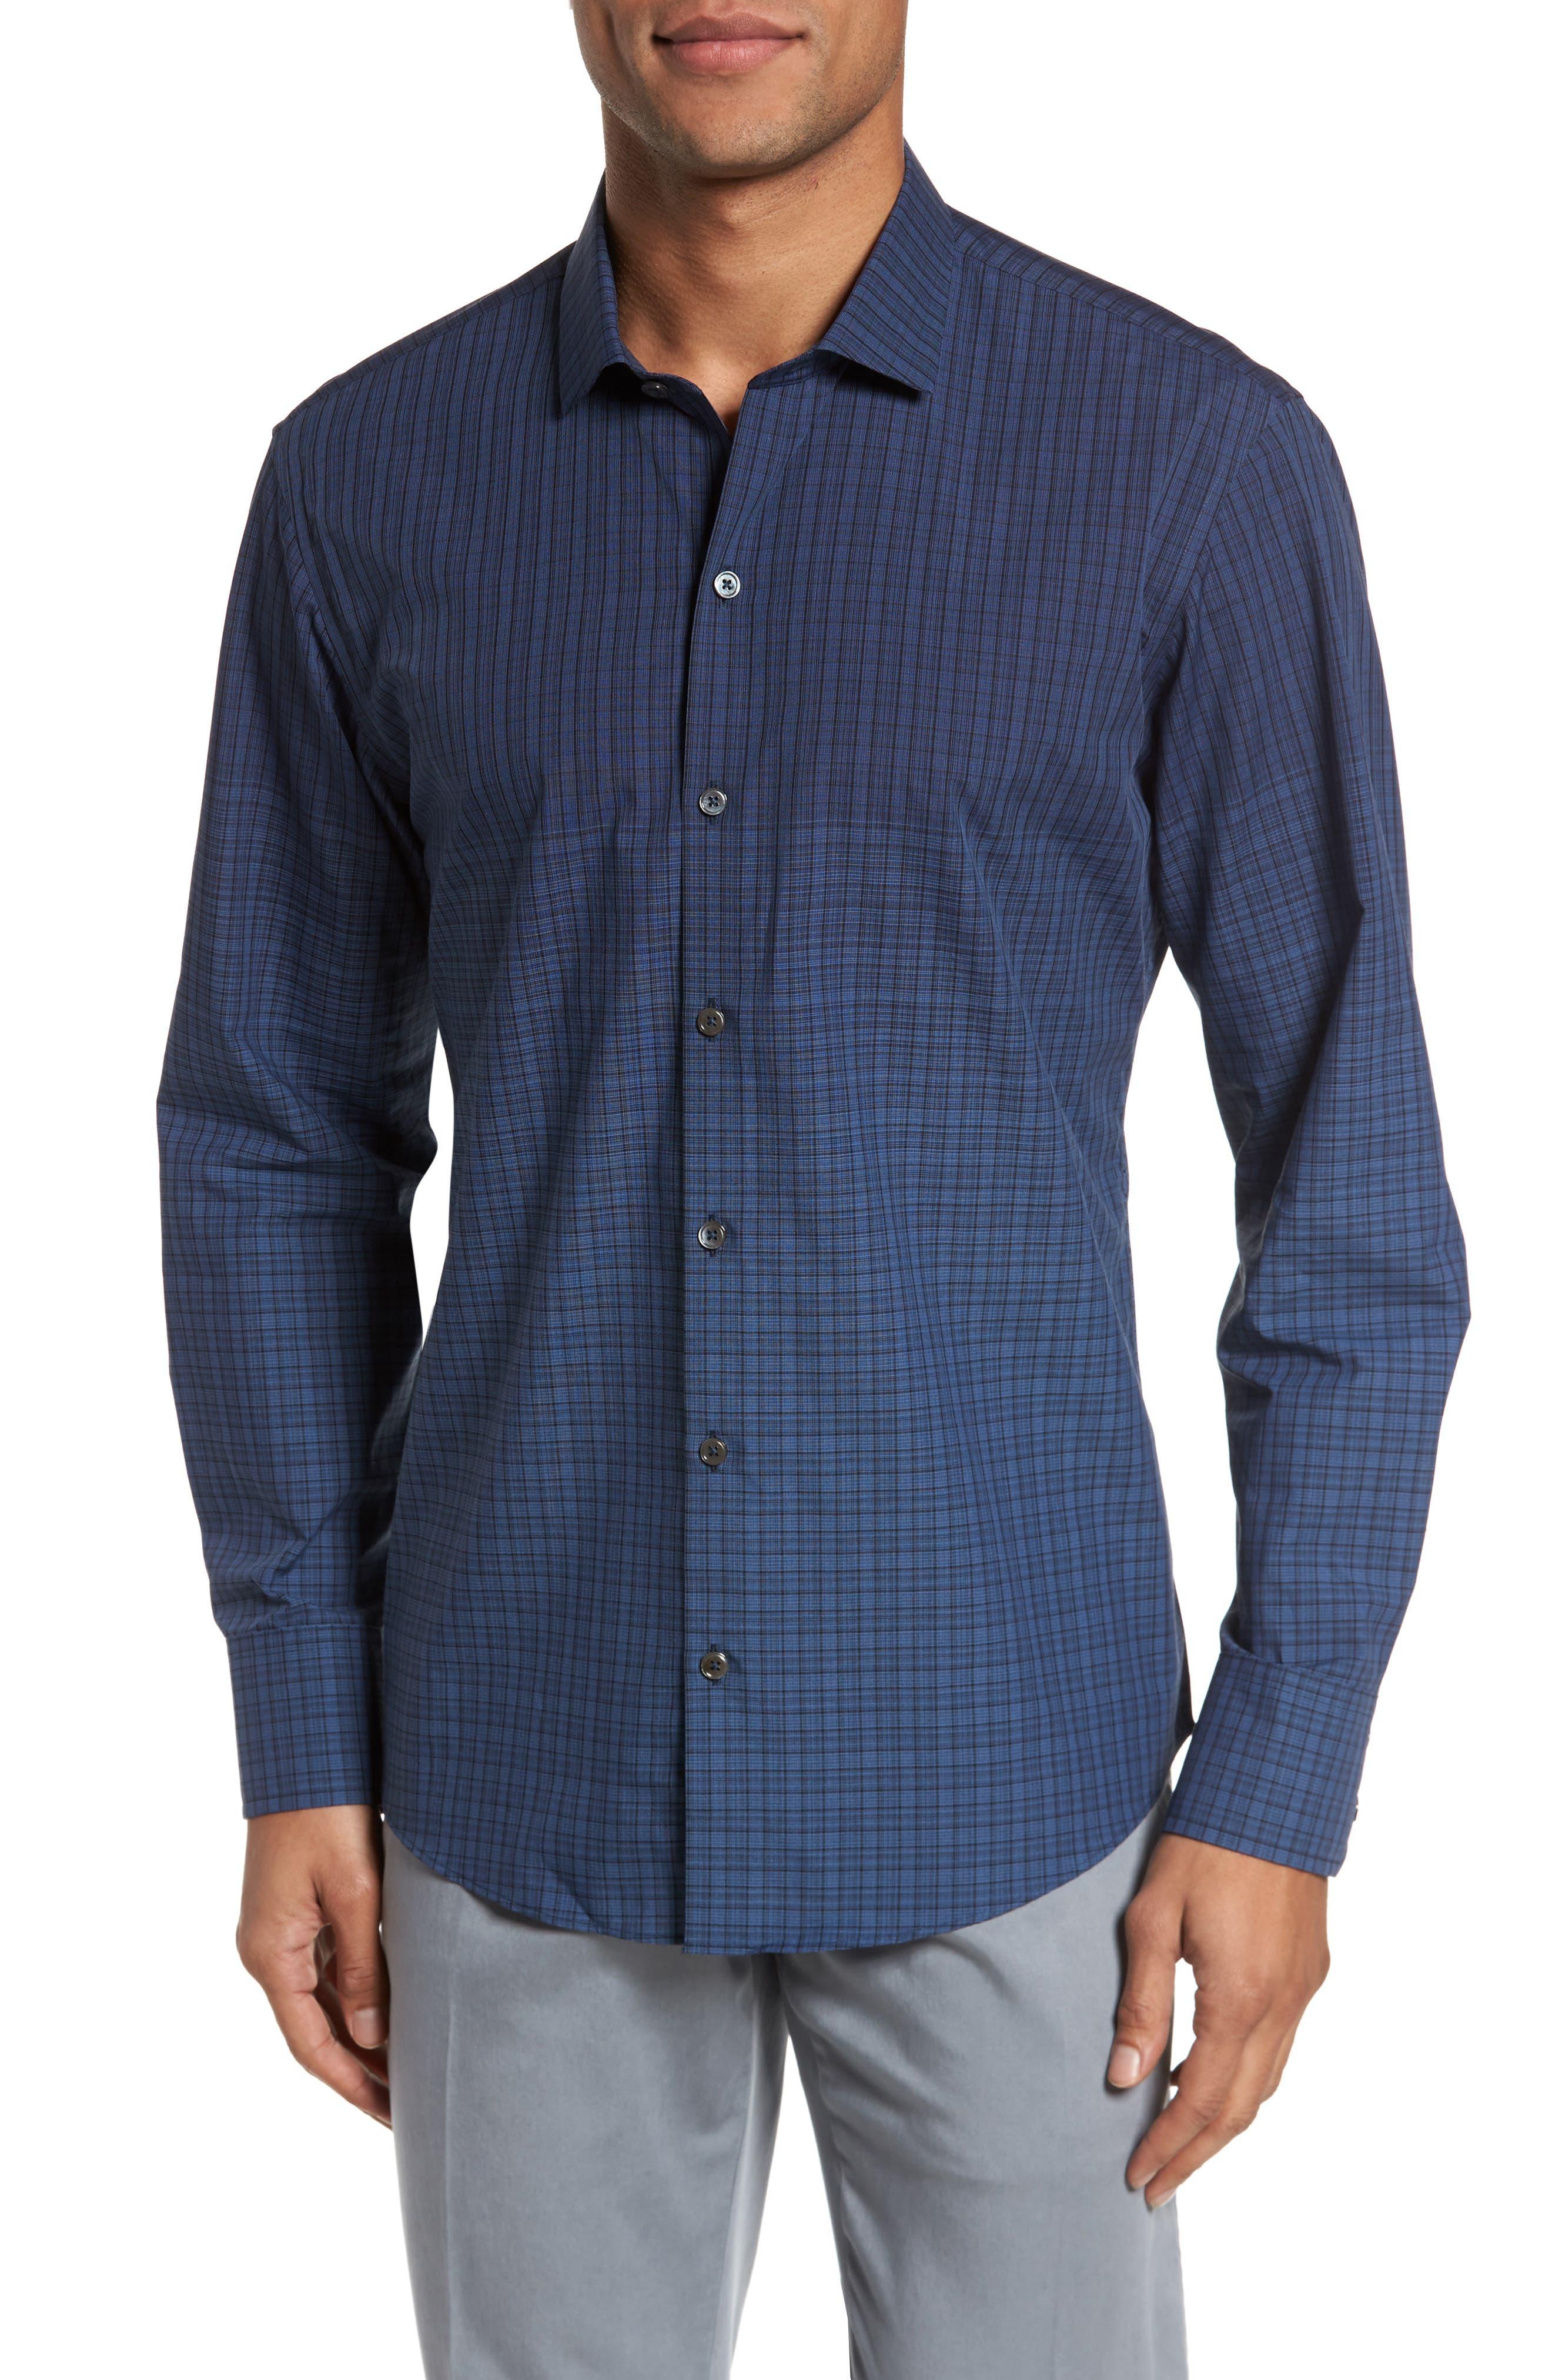 Wein Slim Fit Check Sport Shirt,                             Main thumbnail 1, color,                             401